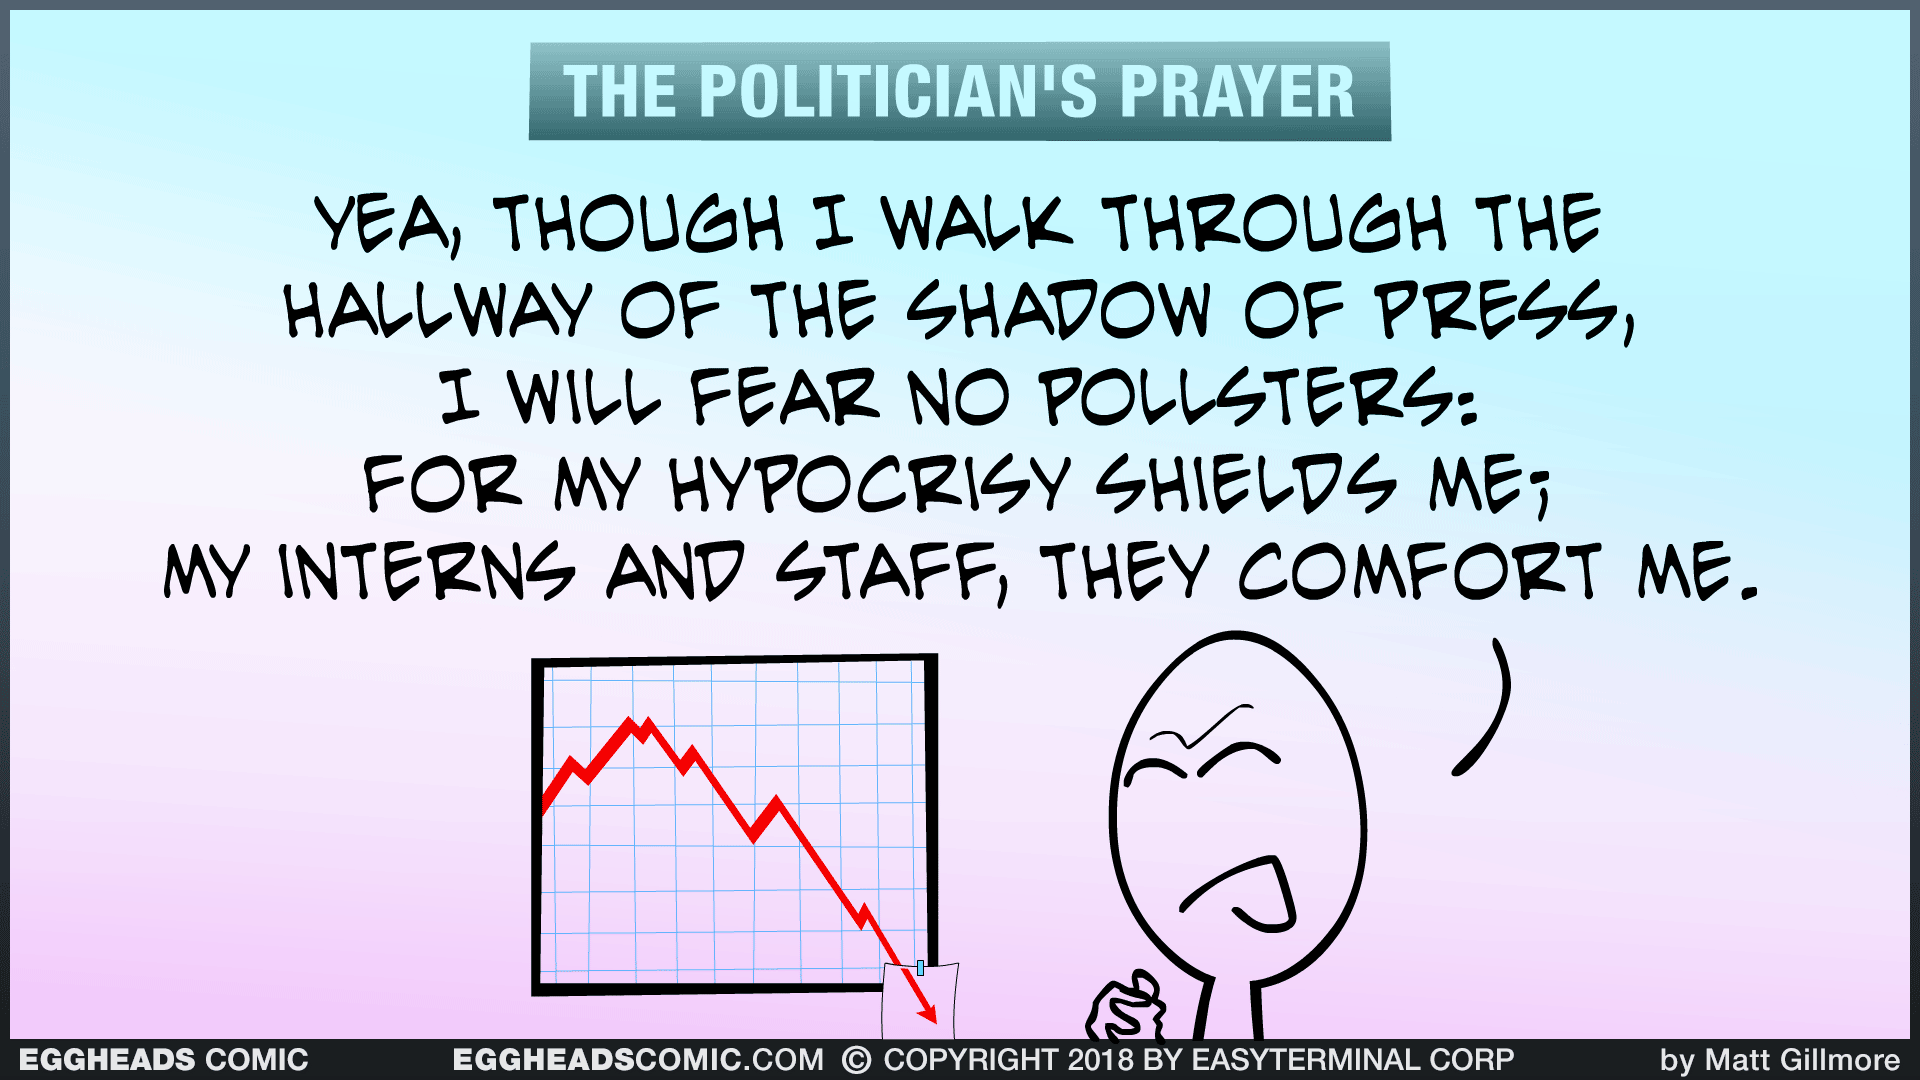 Webcomic Eggheads Comic Strip 117 Politician's Prayer